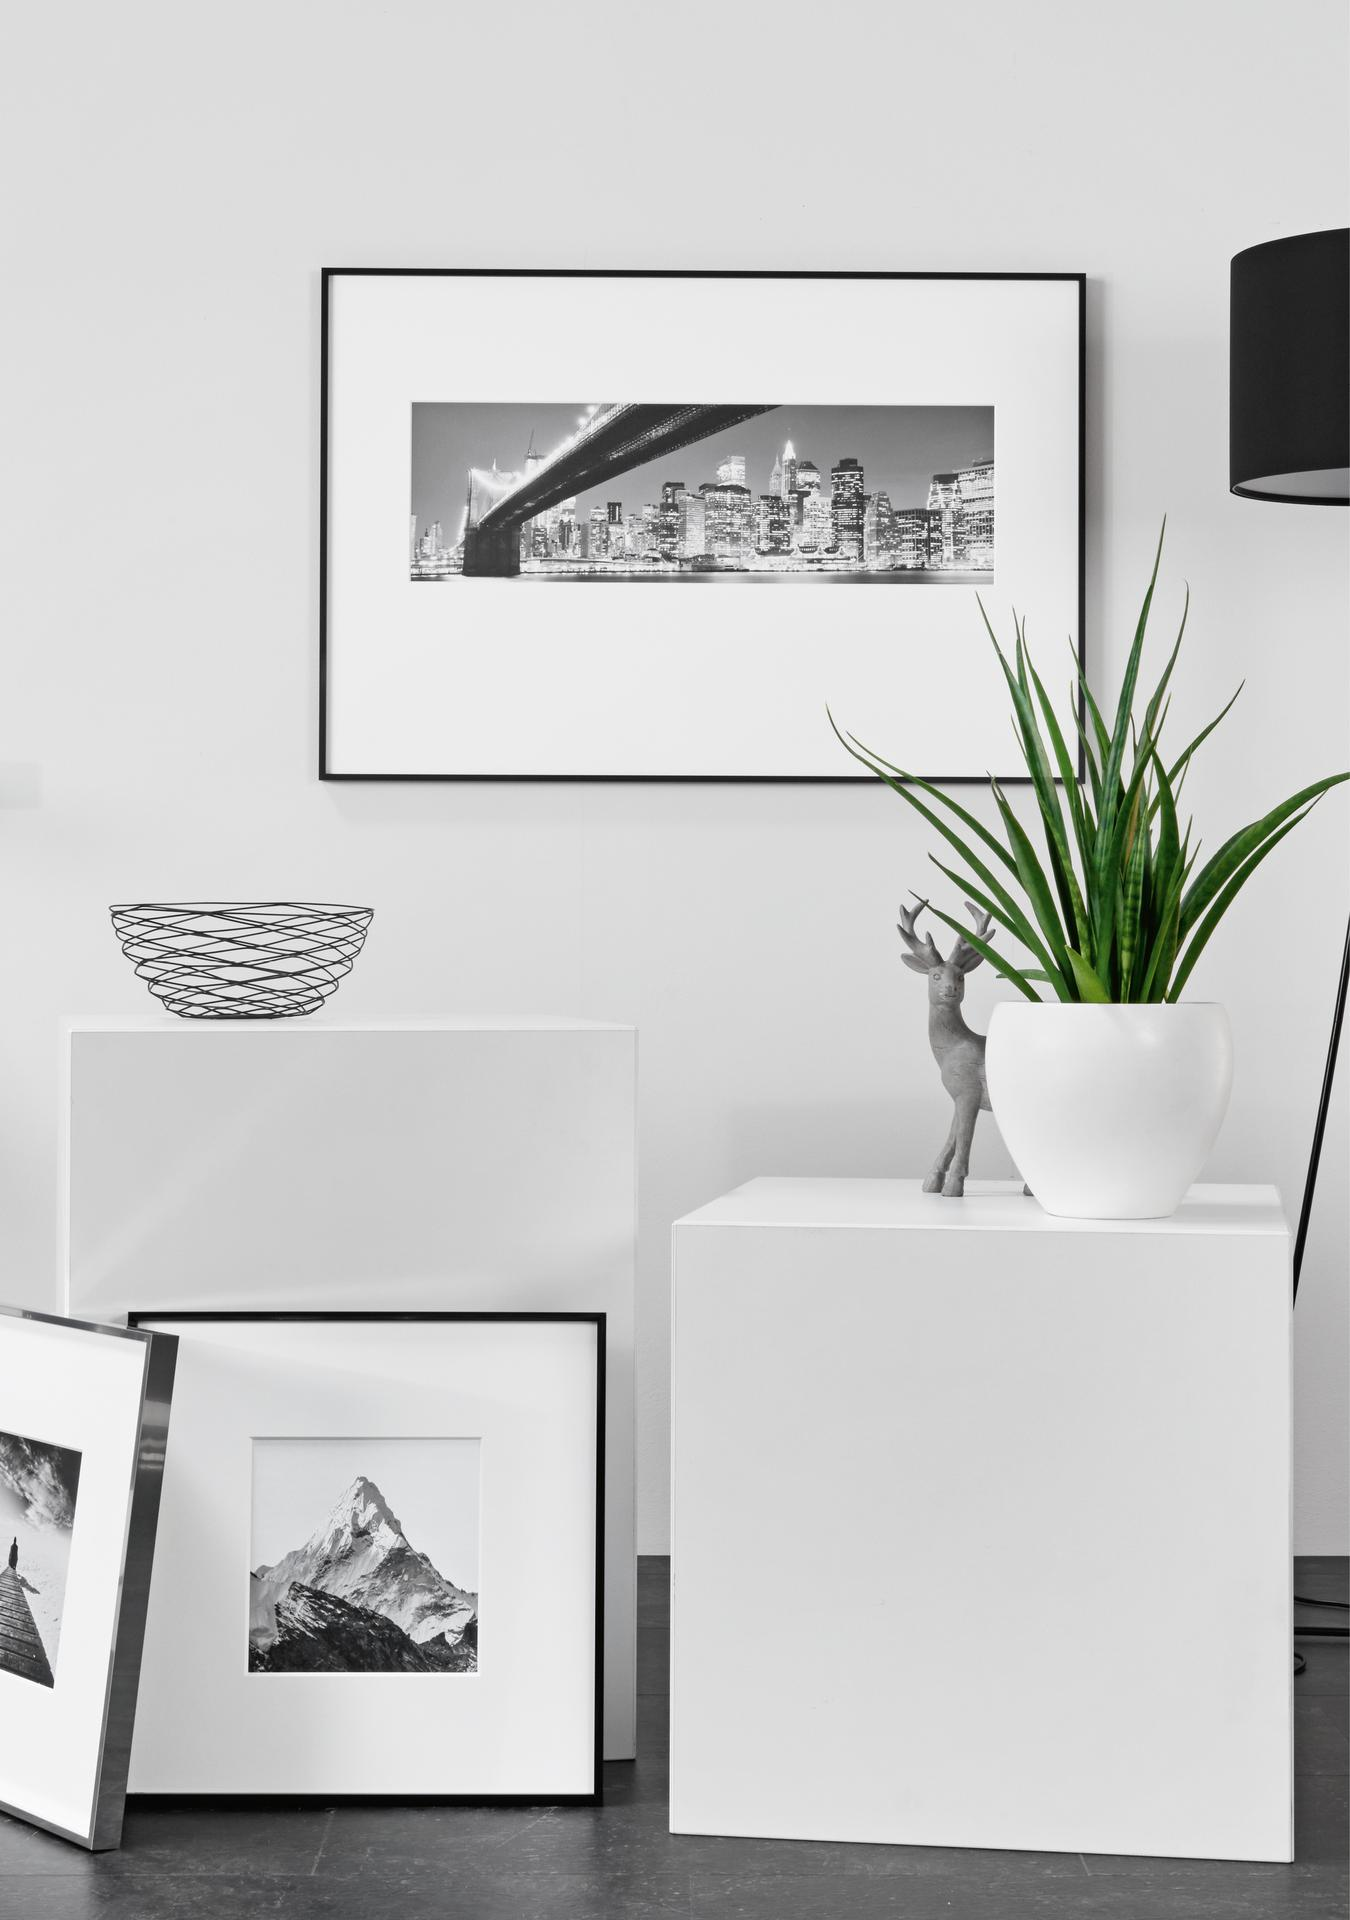 Großartig Bild Framing Greensborough Fotos - Benutzerdefinierte ...